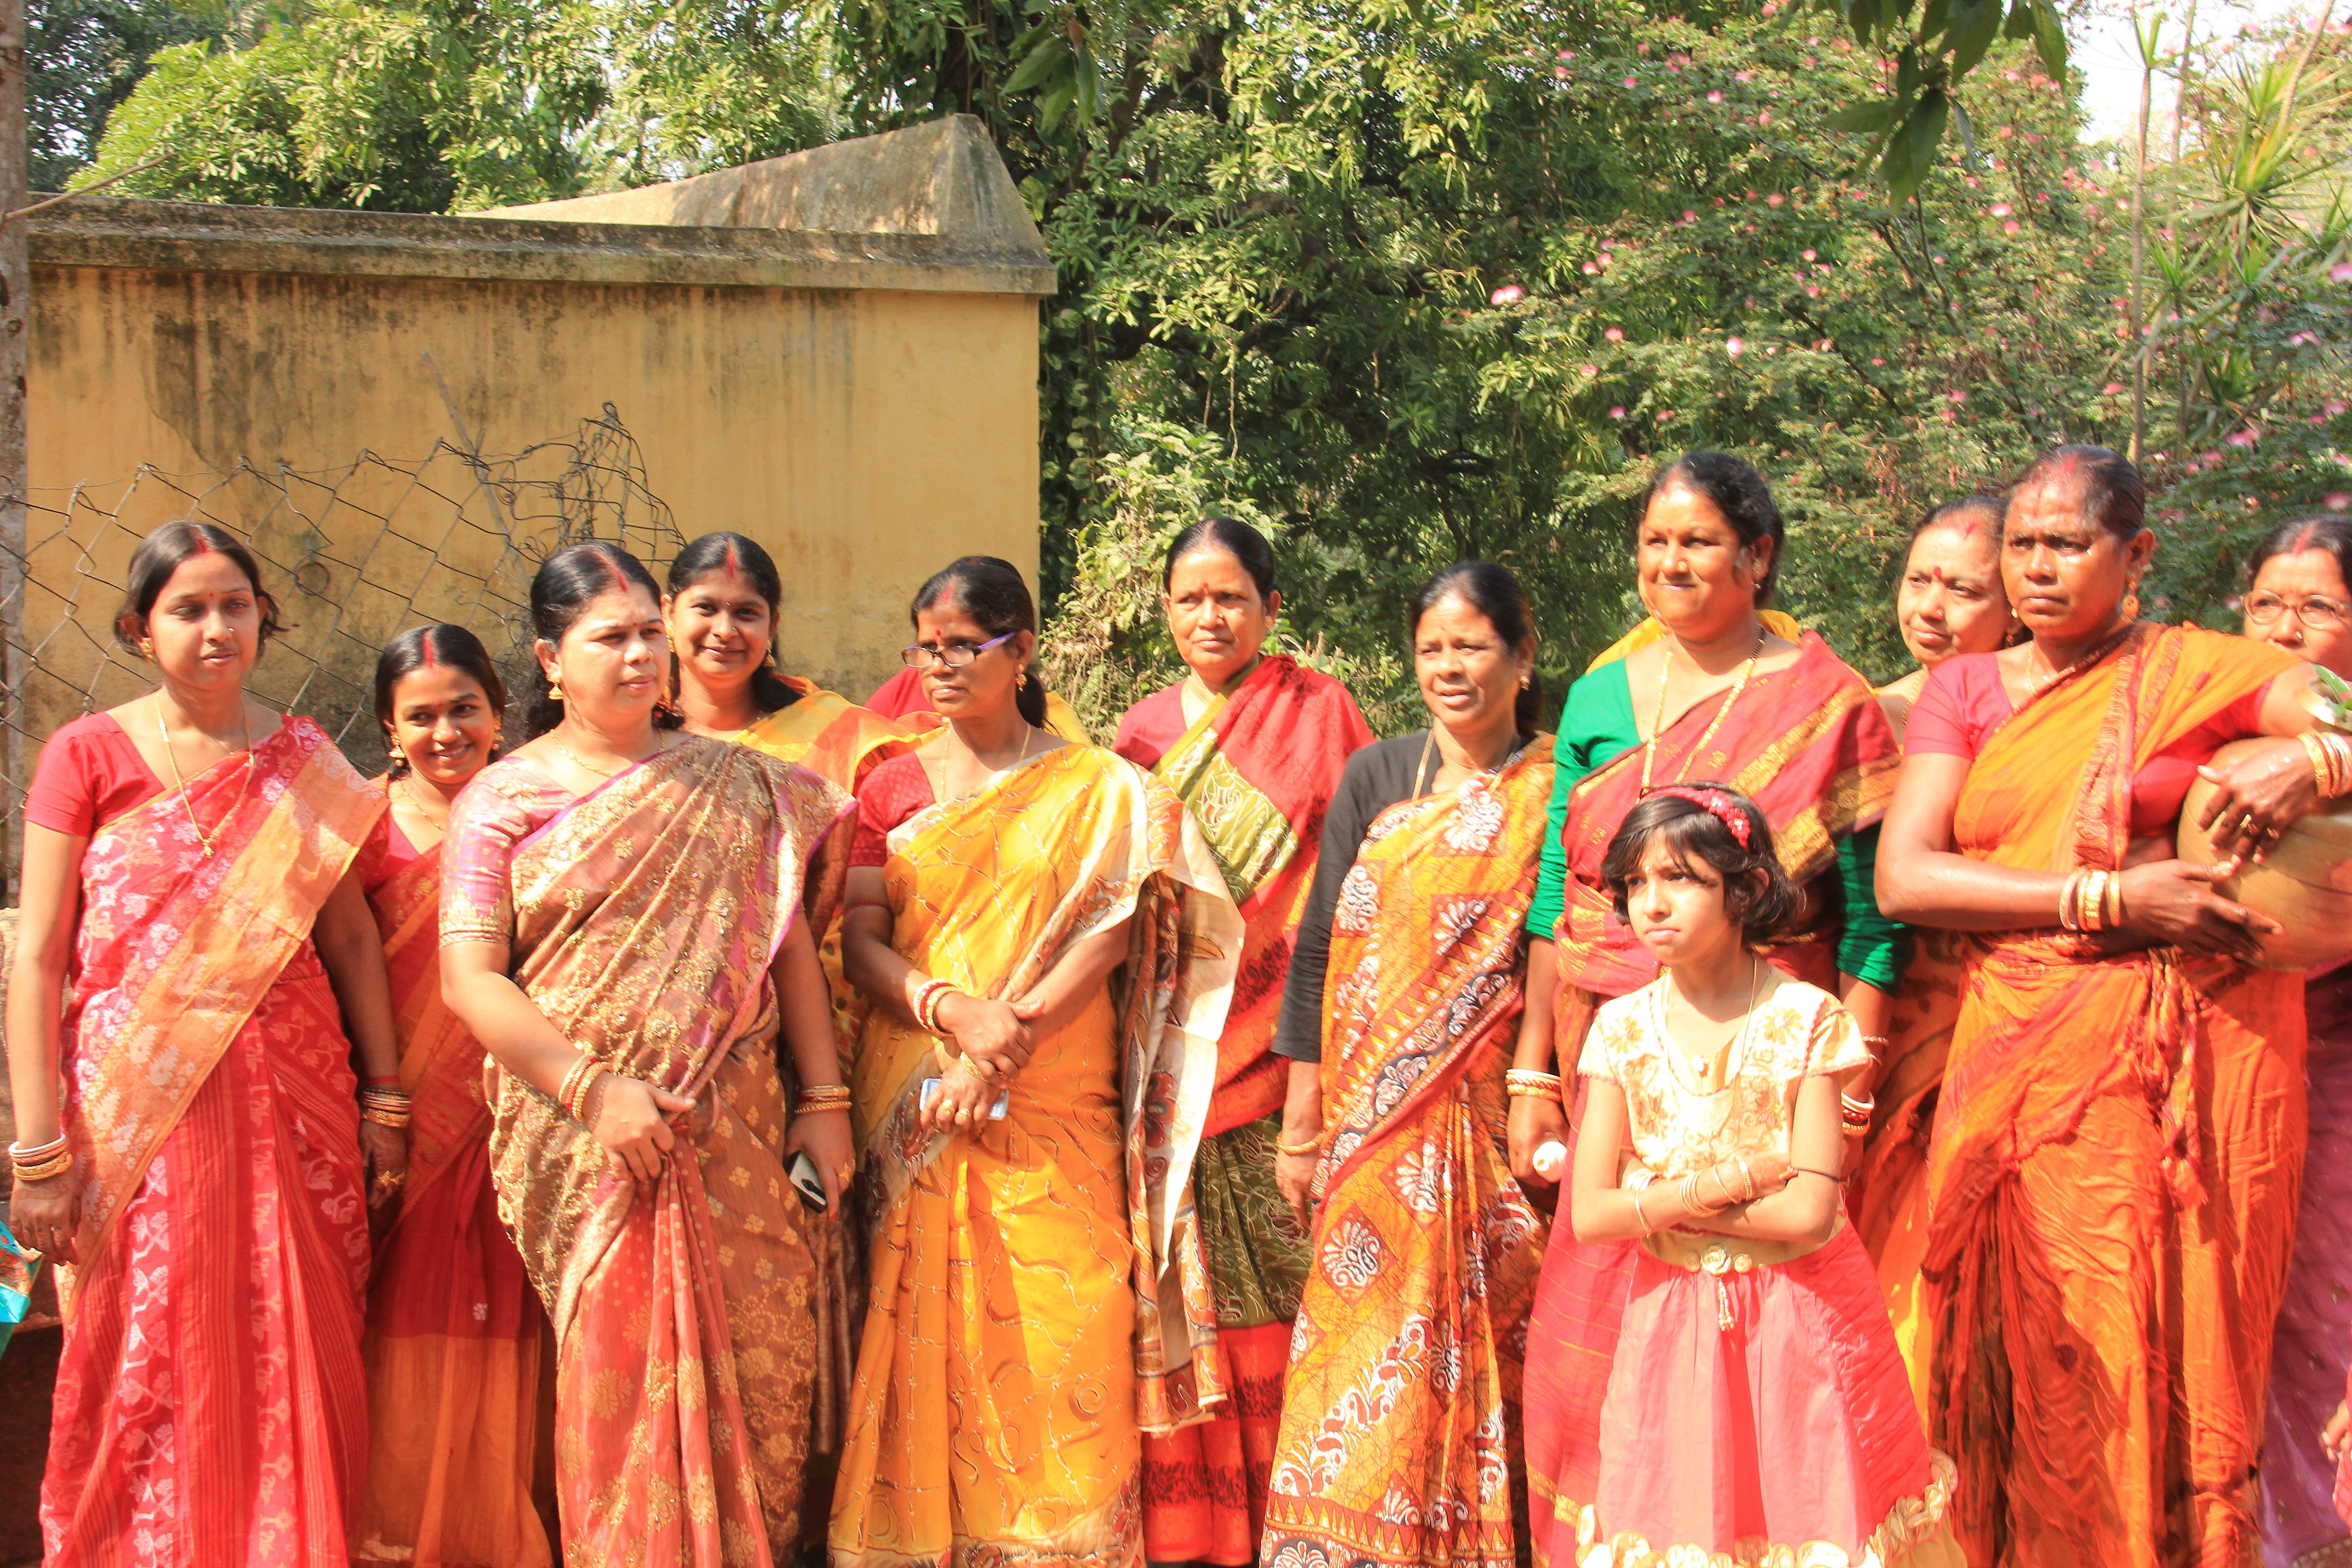 Wedding rituals in a Bengali village